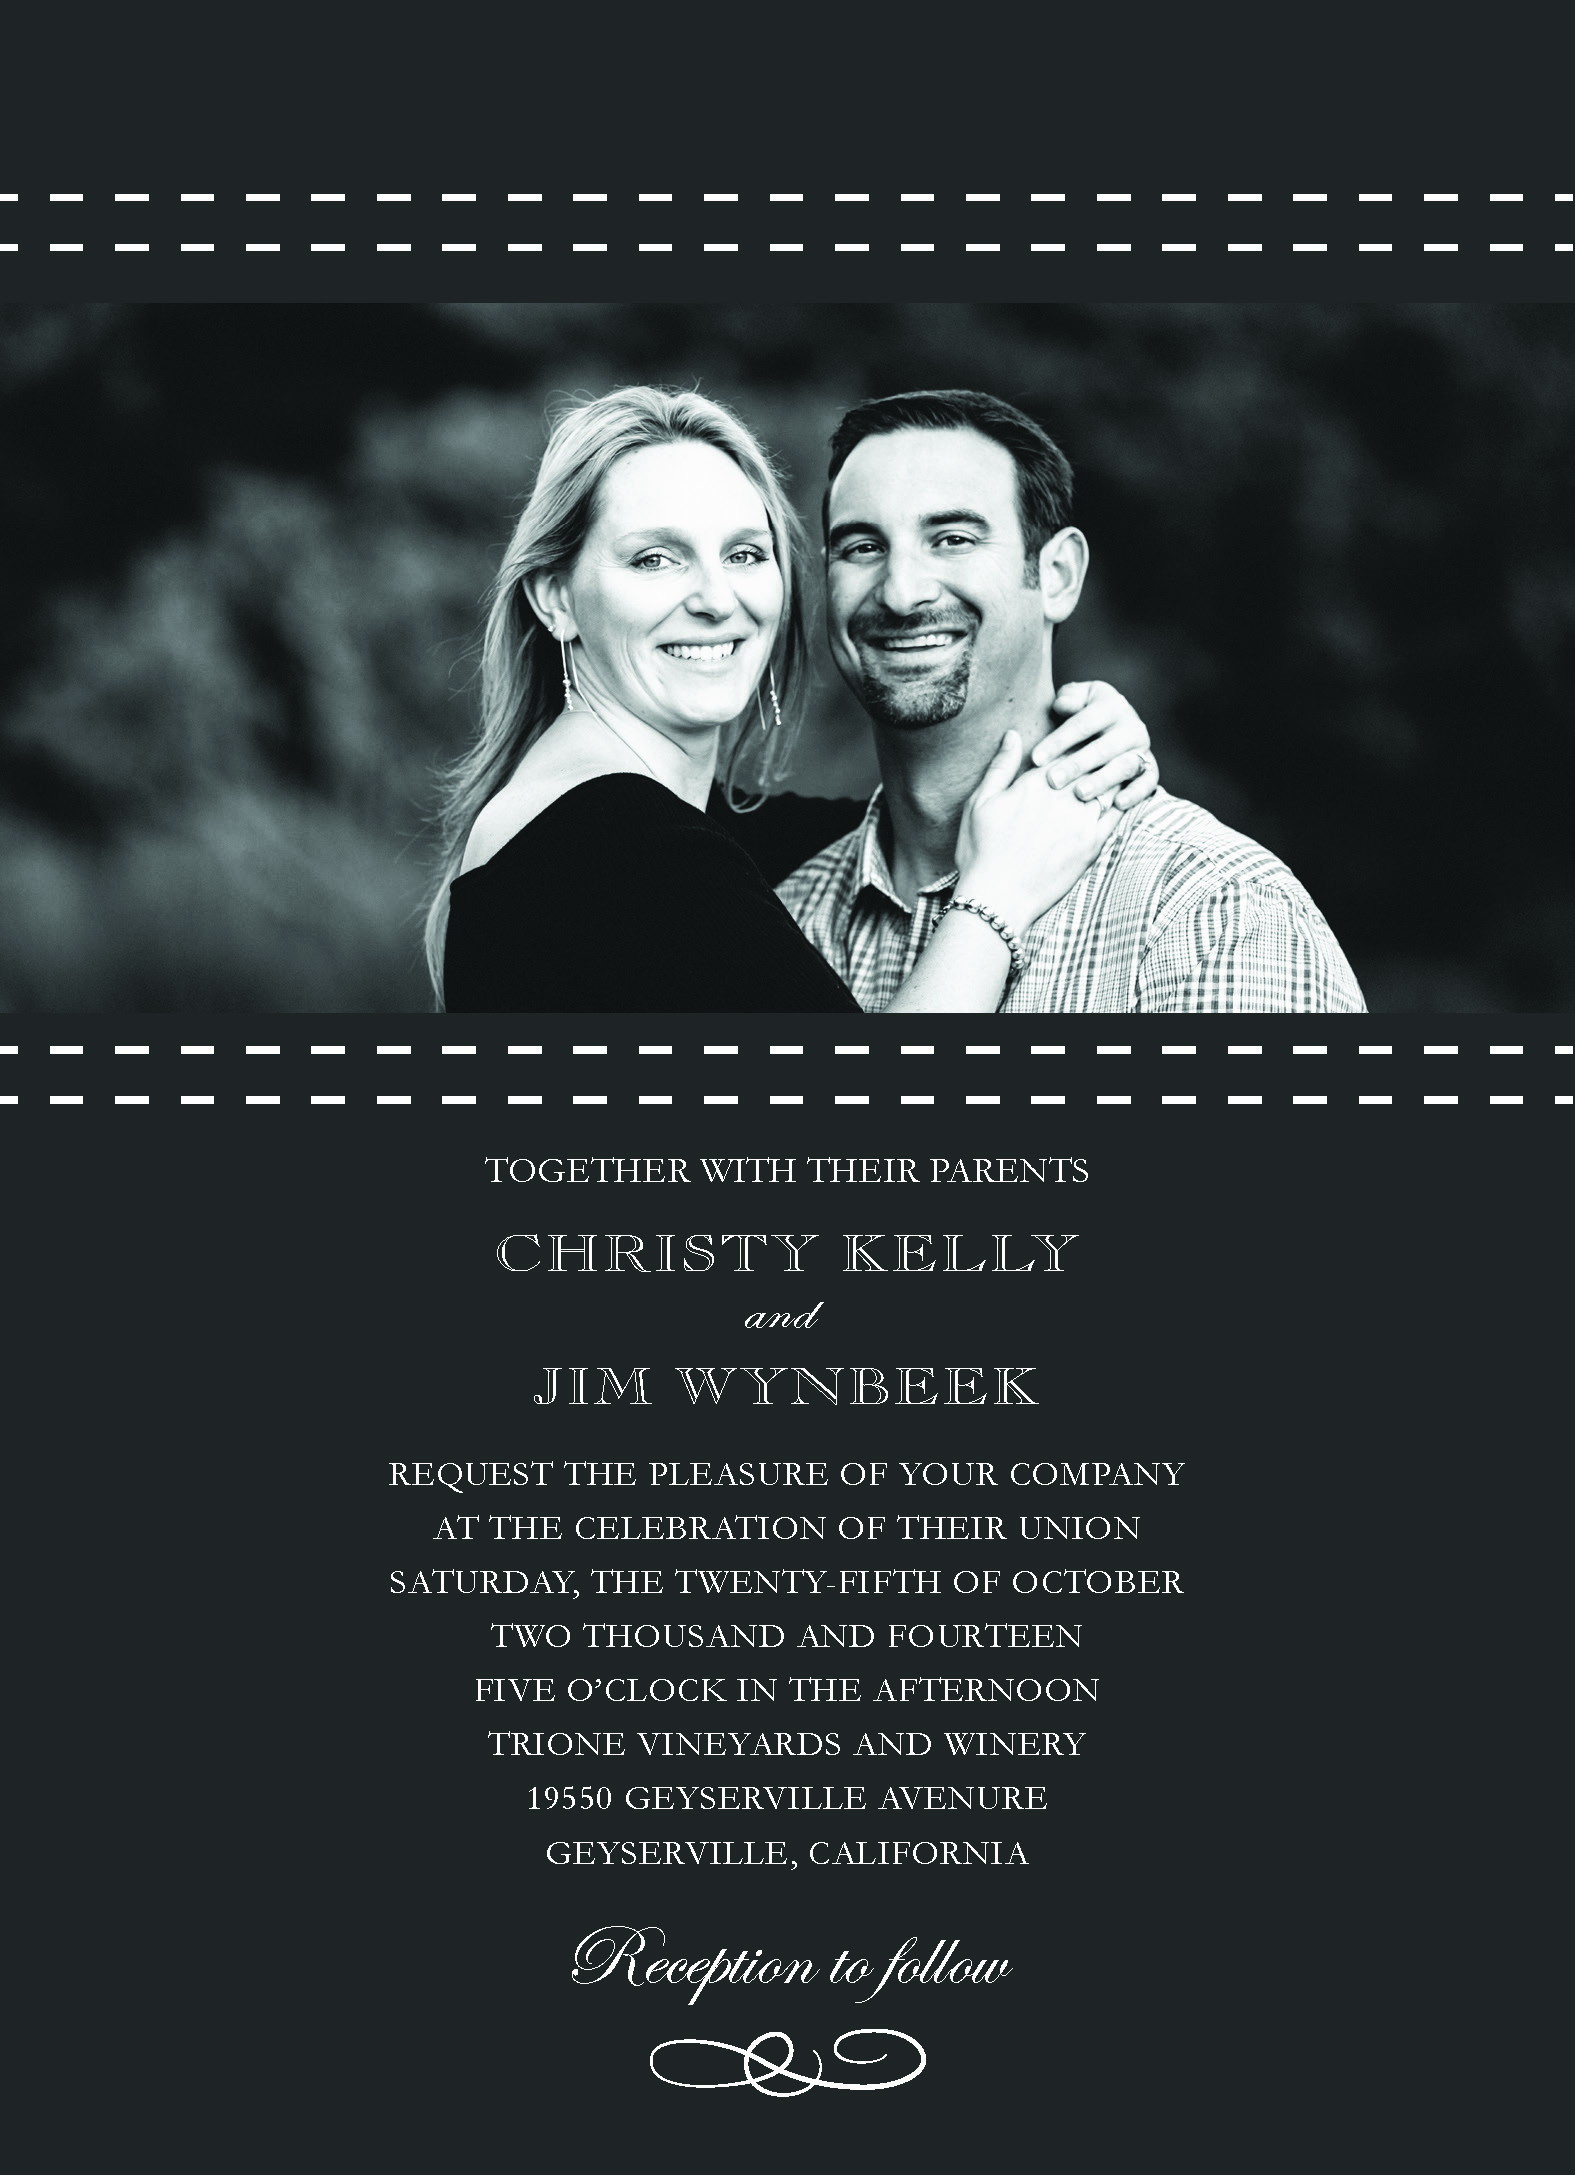 Christy Kelly Invitation 35696_Page_1.jpg